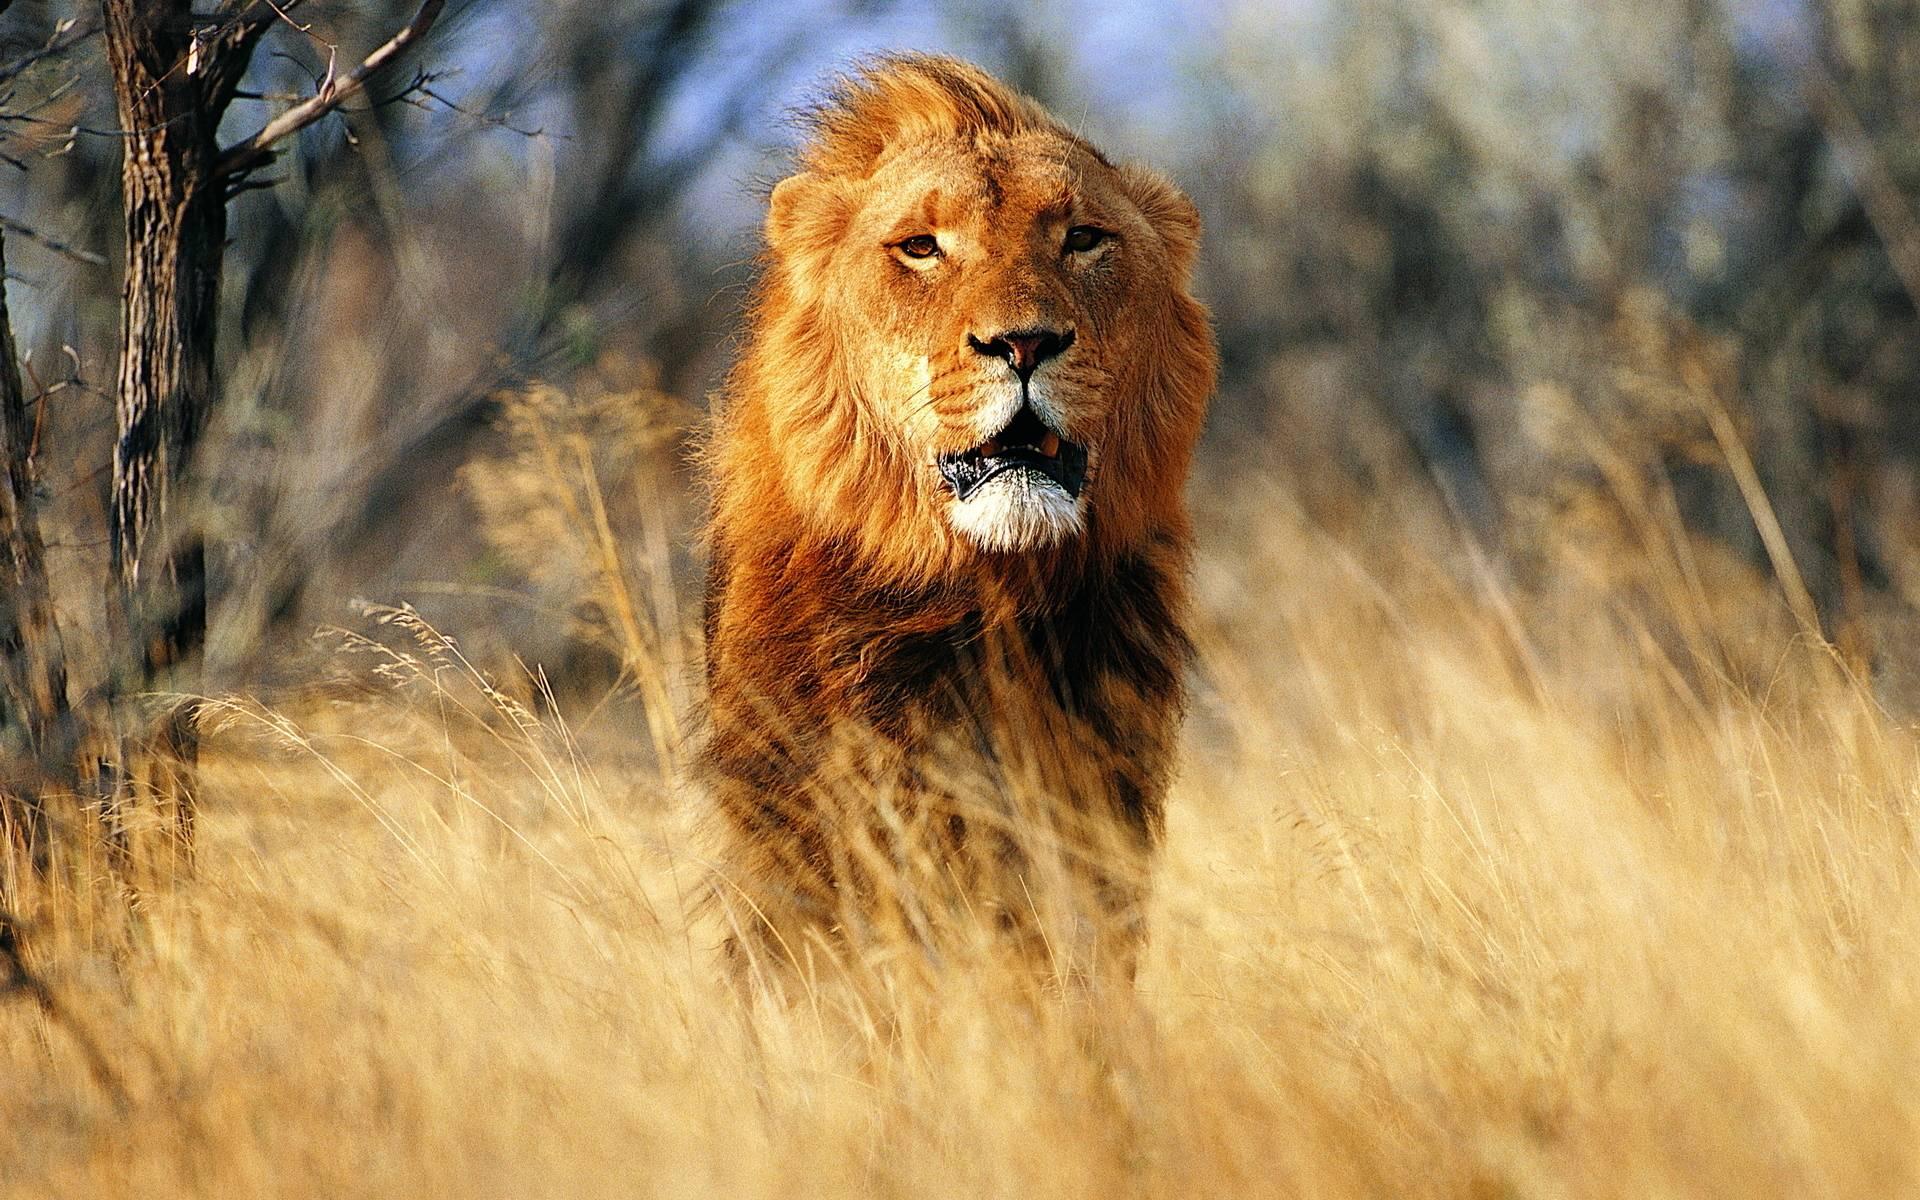 Wallpaper download lion - Download Lion Desktop Wallpaper Wallpapercapital